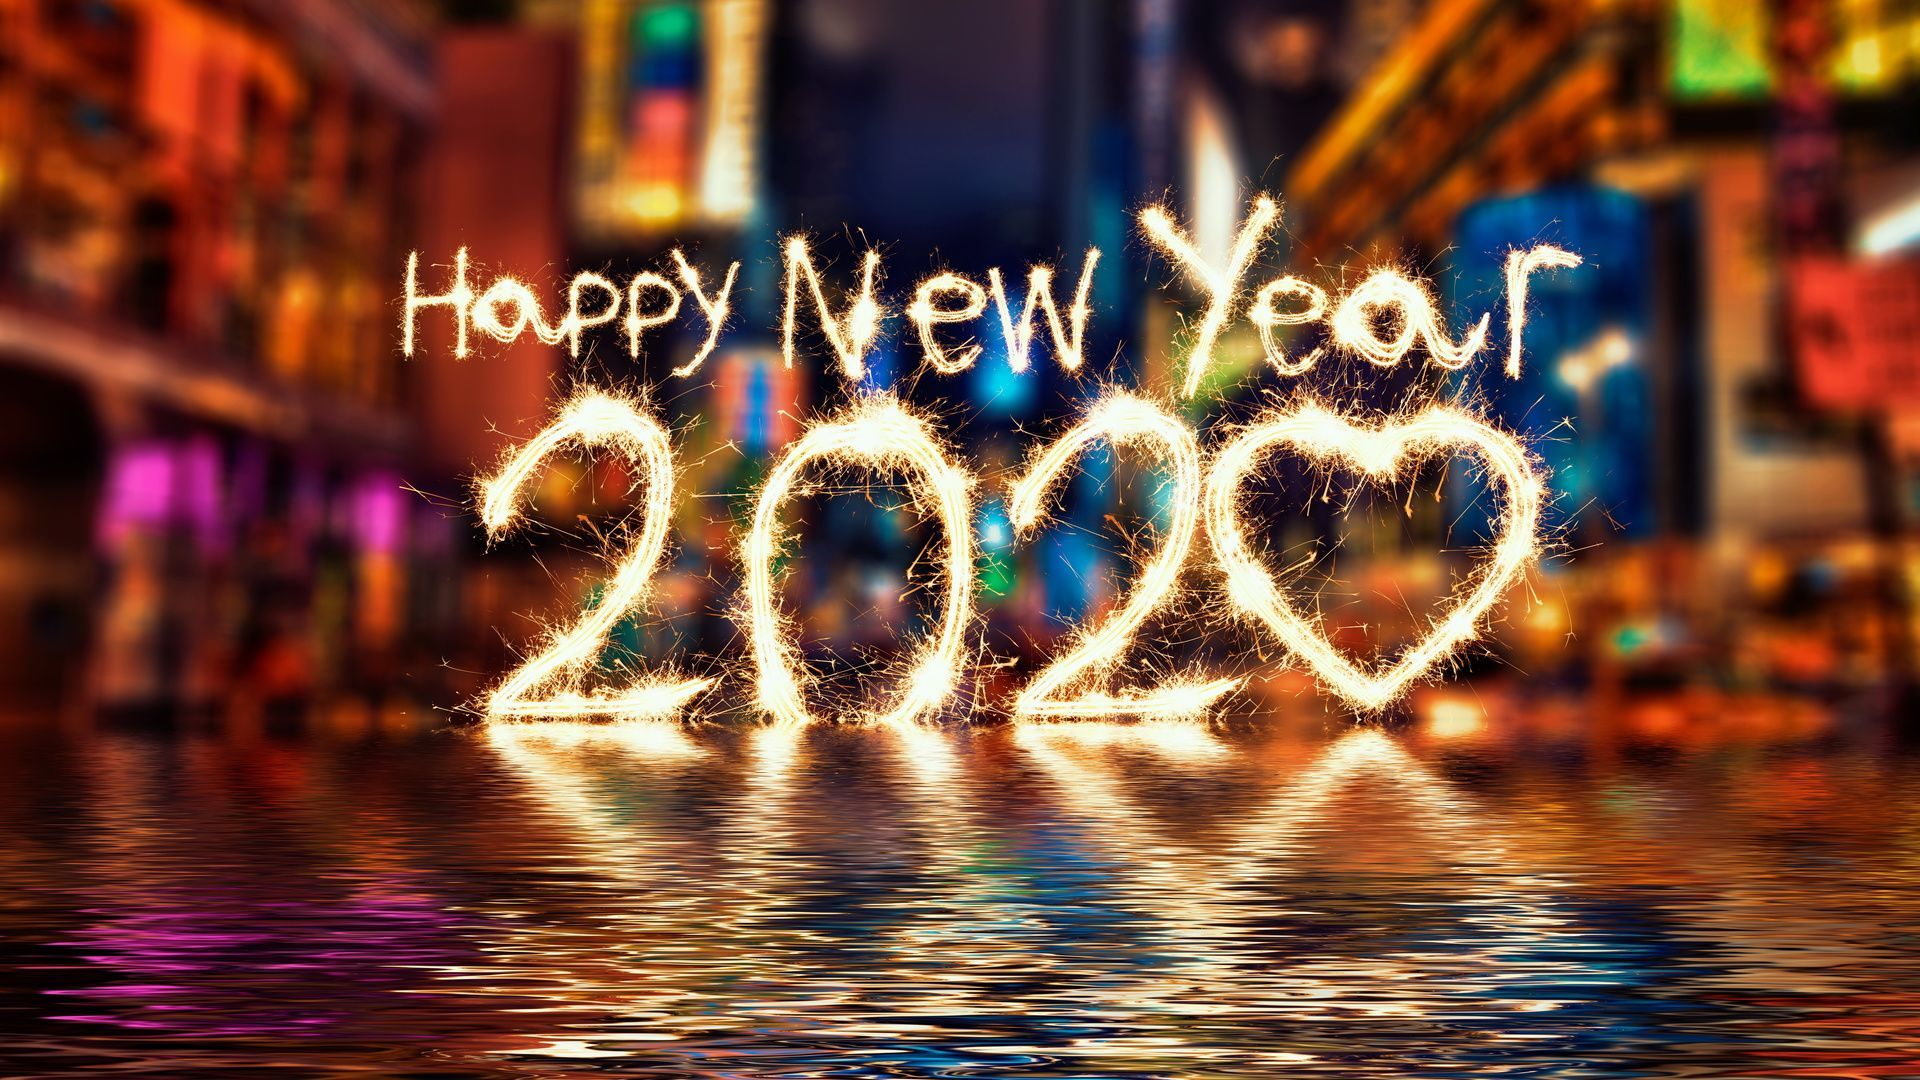 Happy New Year 2020 Wallpapers For Desktop Happy New Year Images Happy New Year Wallpaper New Year Wallpaper